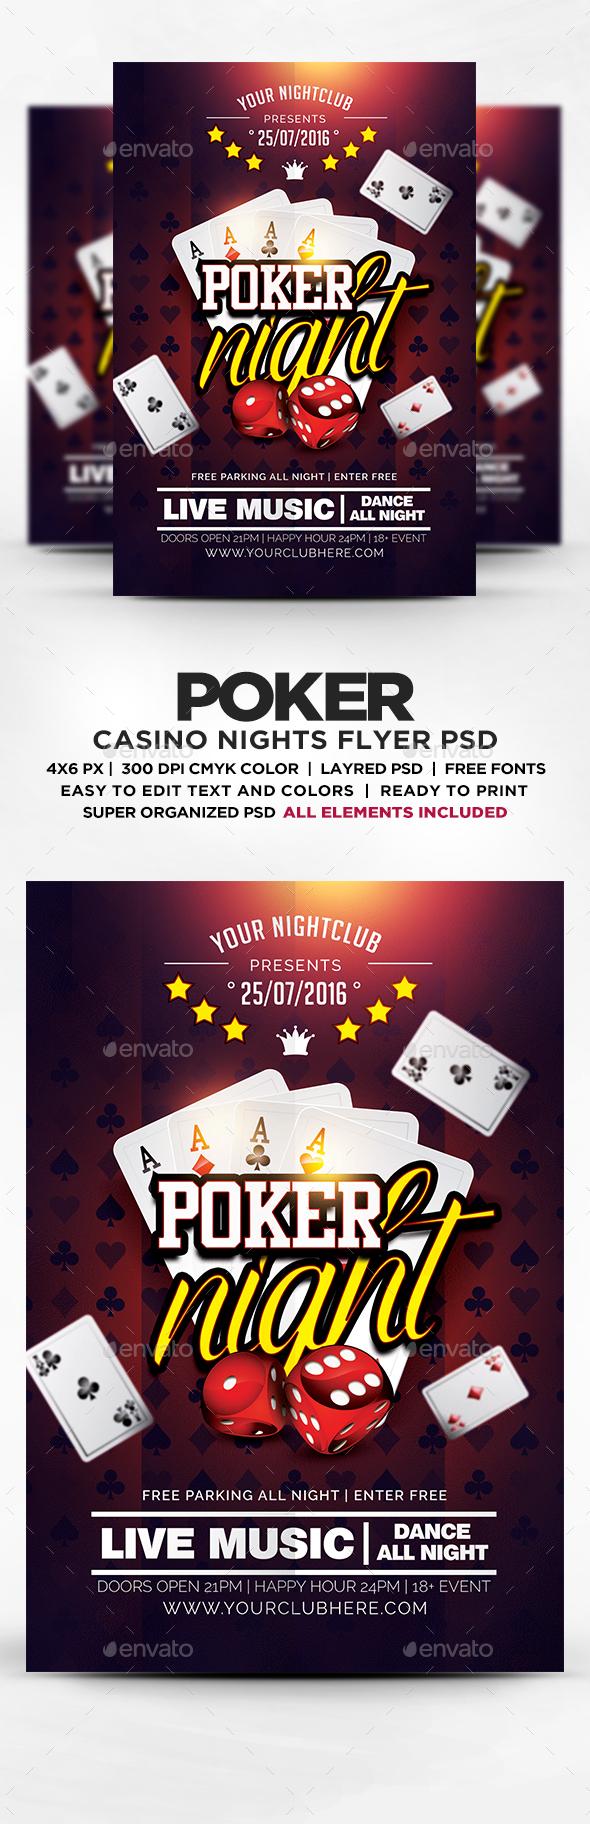 Poker Night Flyer Template PSD